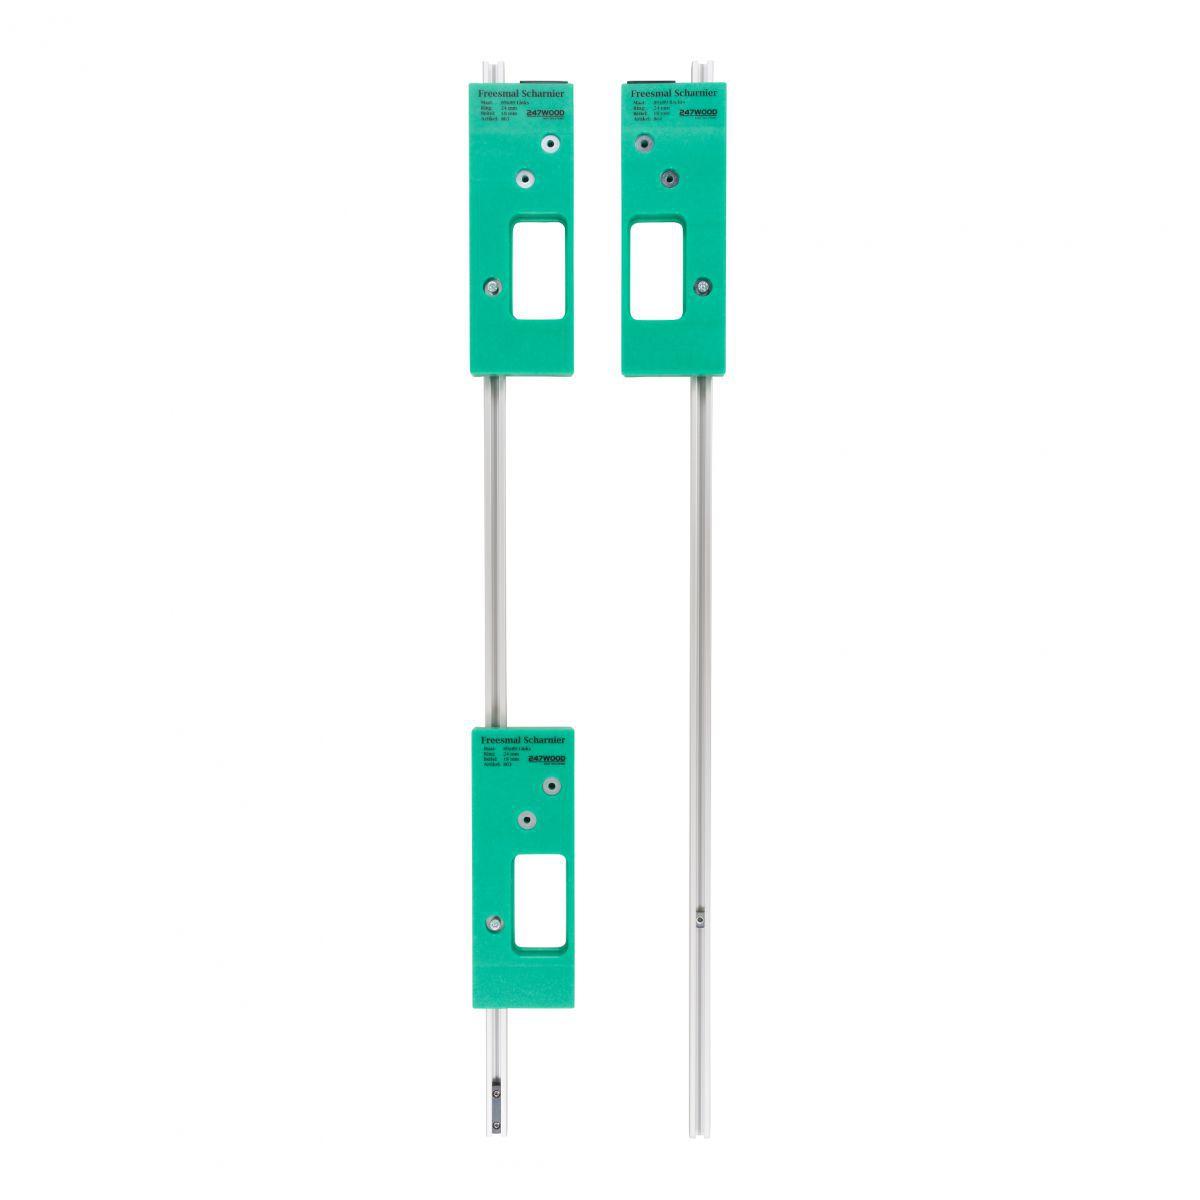 3 piece router template set size 89x89